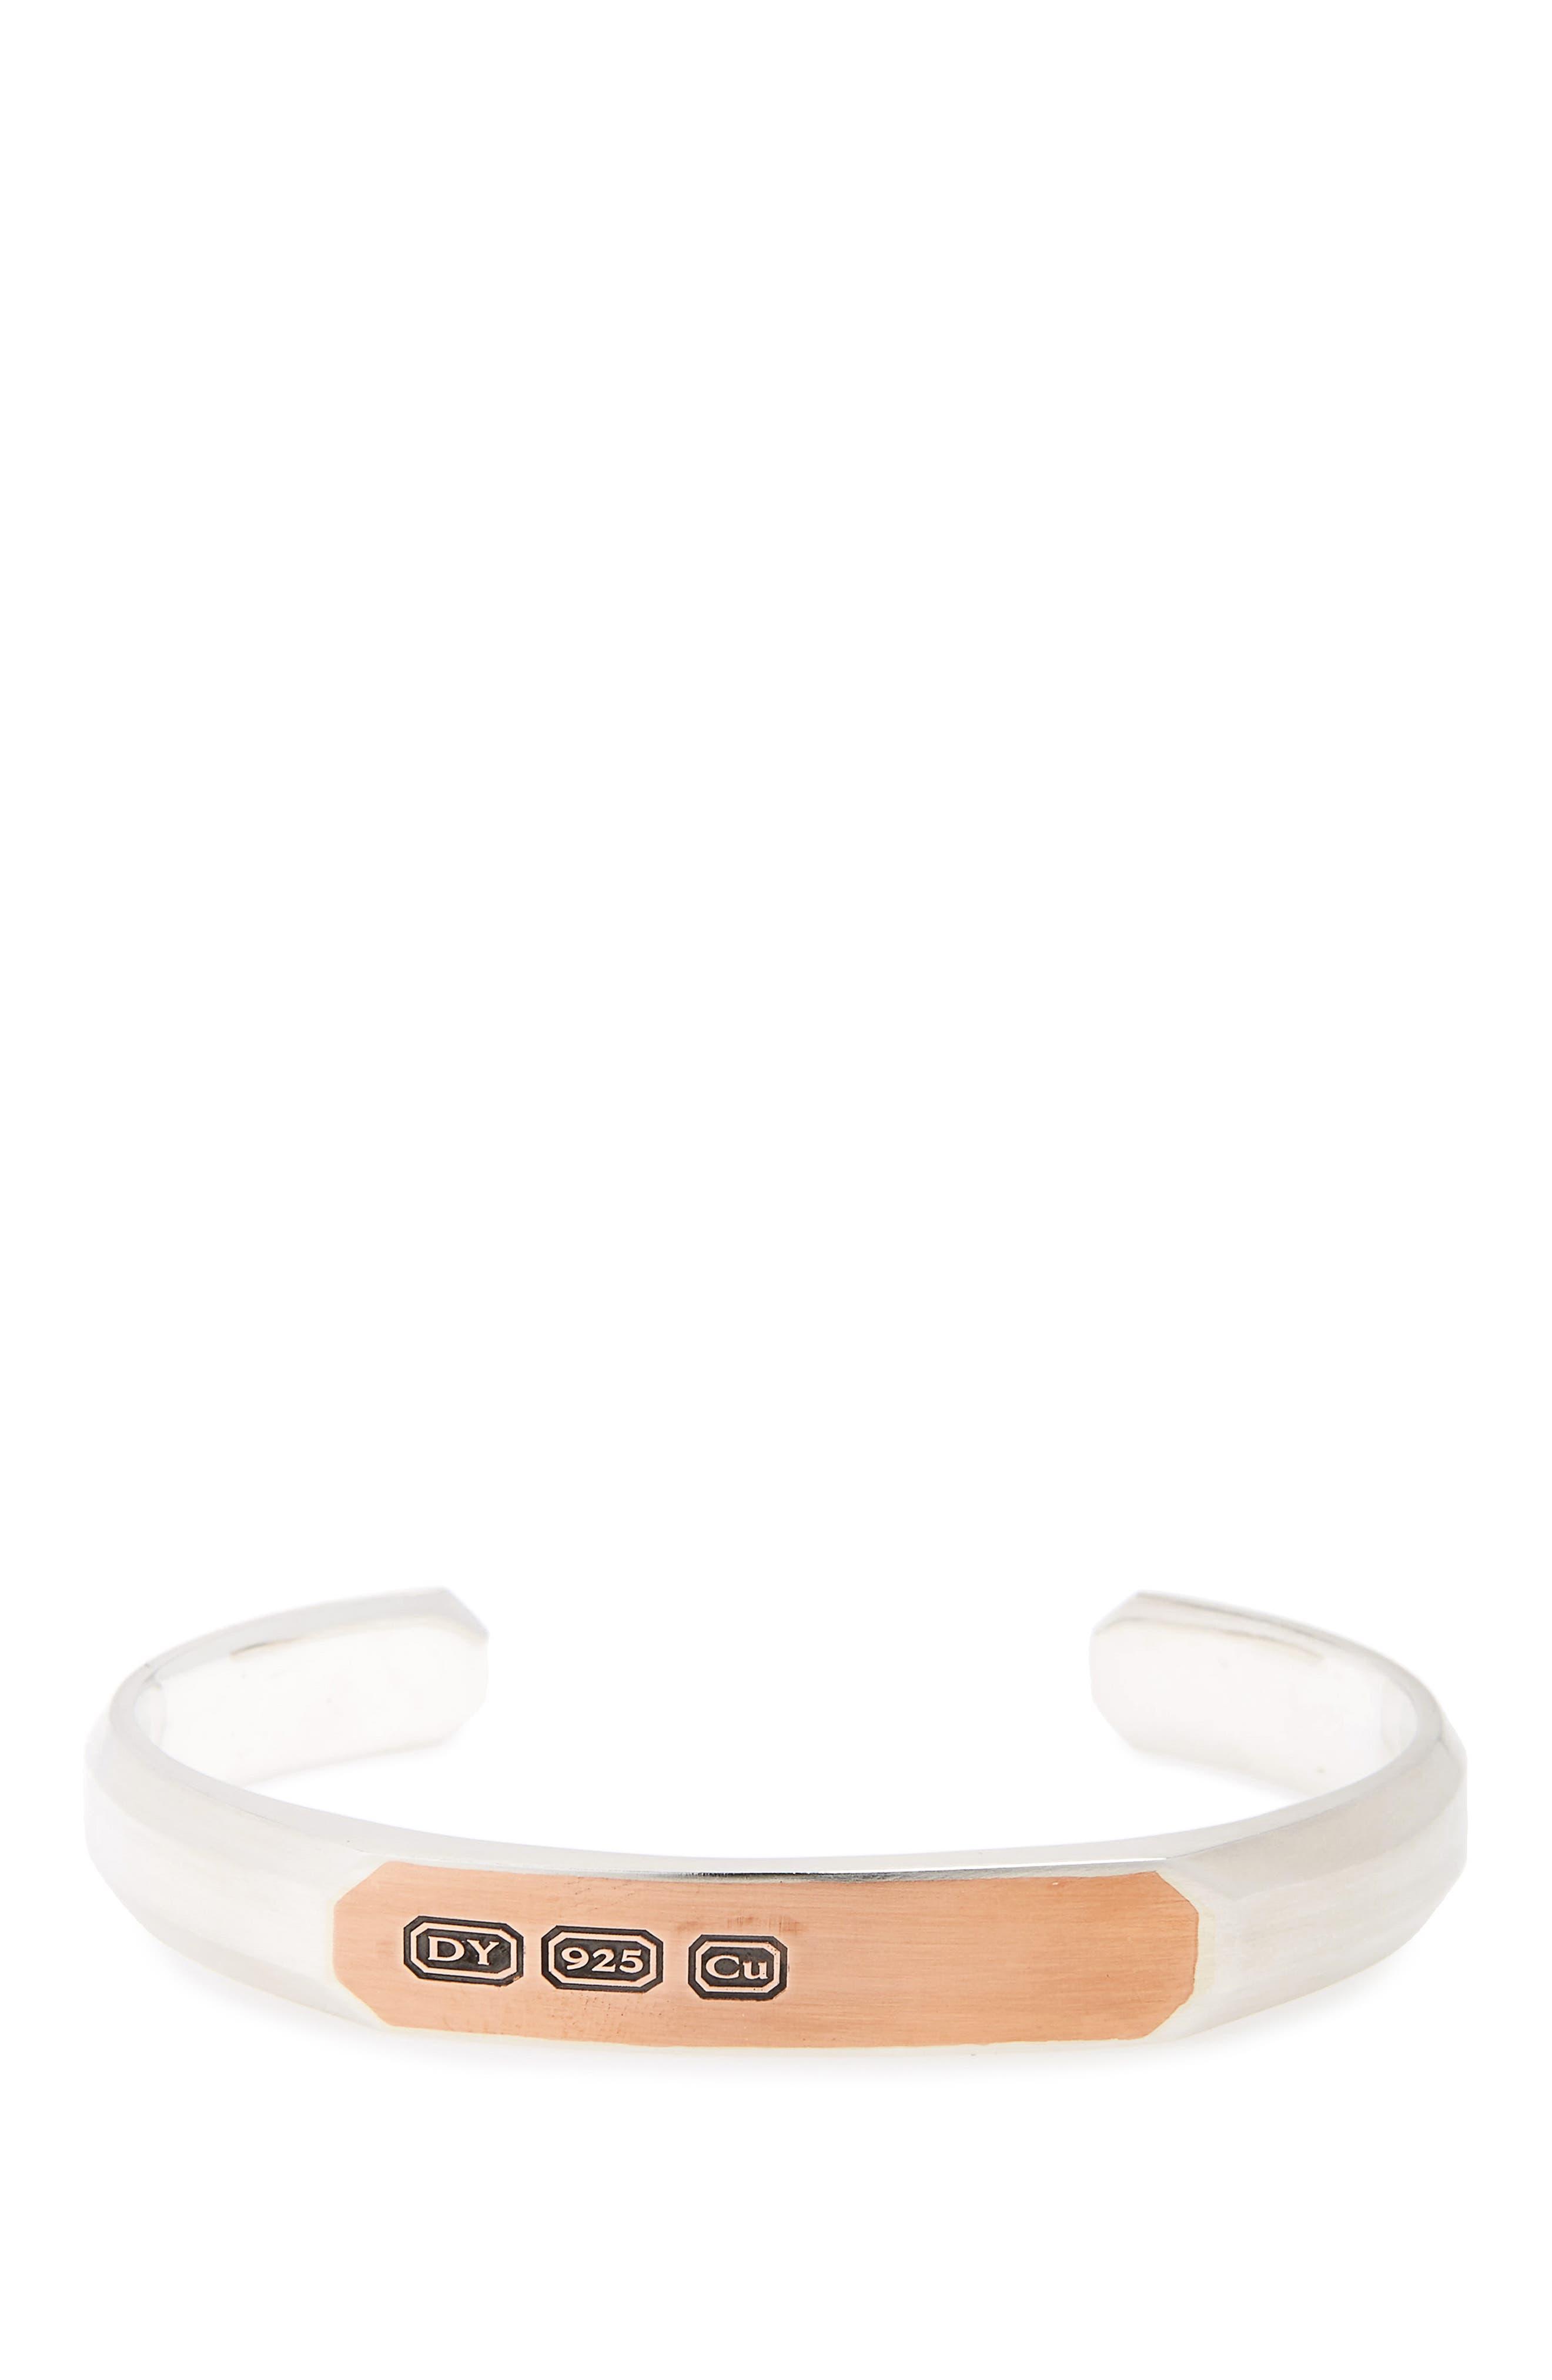 Heirloom Streamline Cuff Bracelet,                             Main thumbnail 1, color,                             SILVER/ COPPER